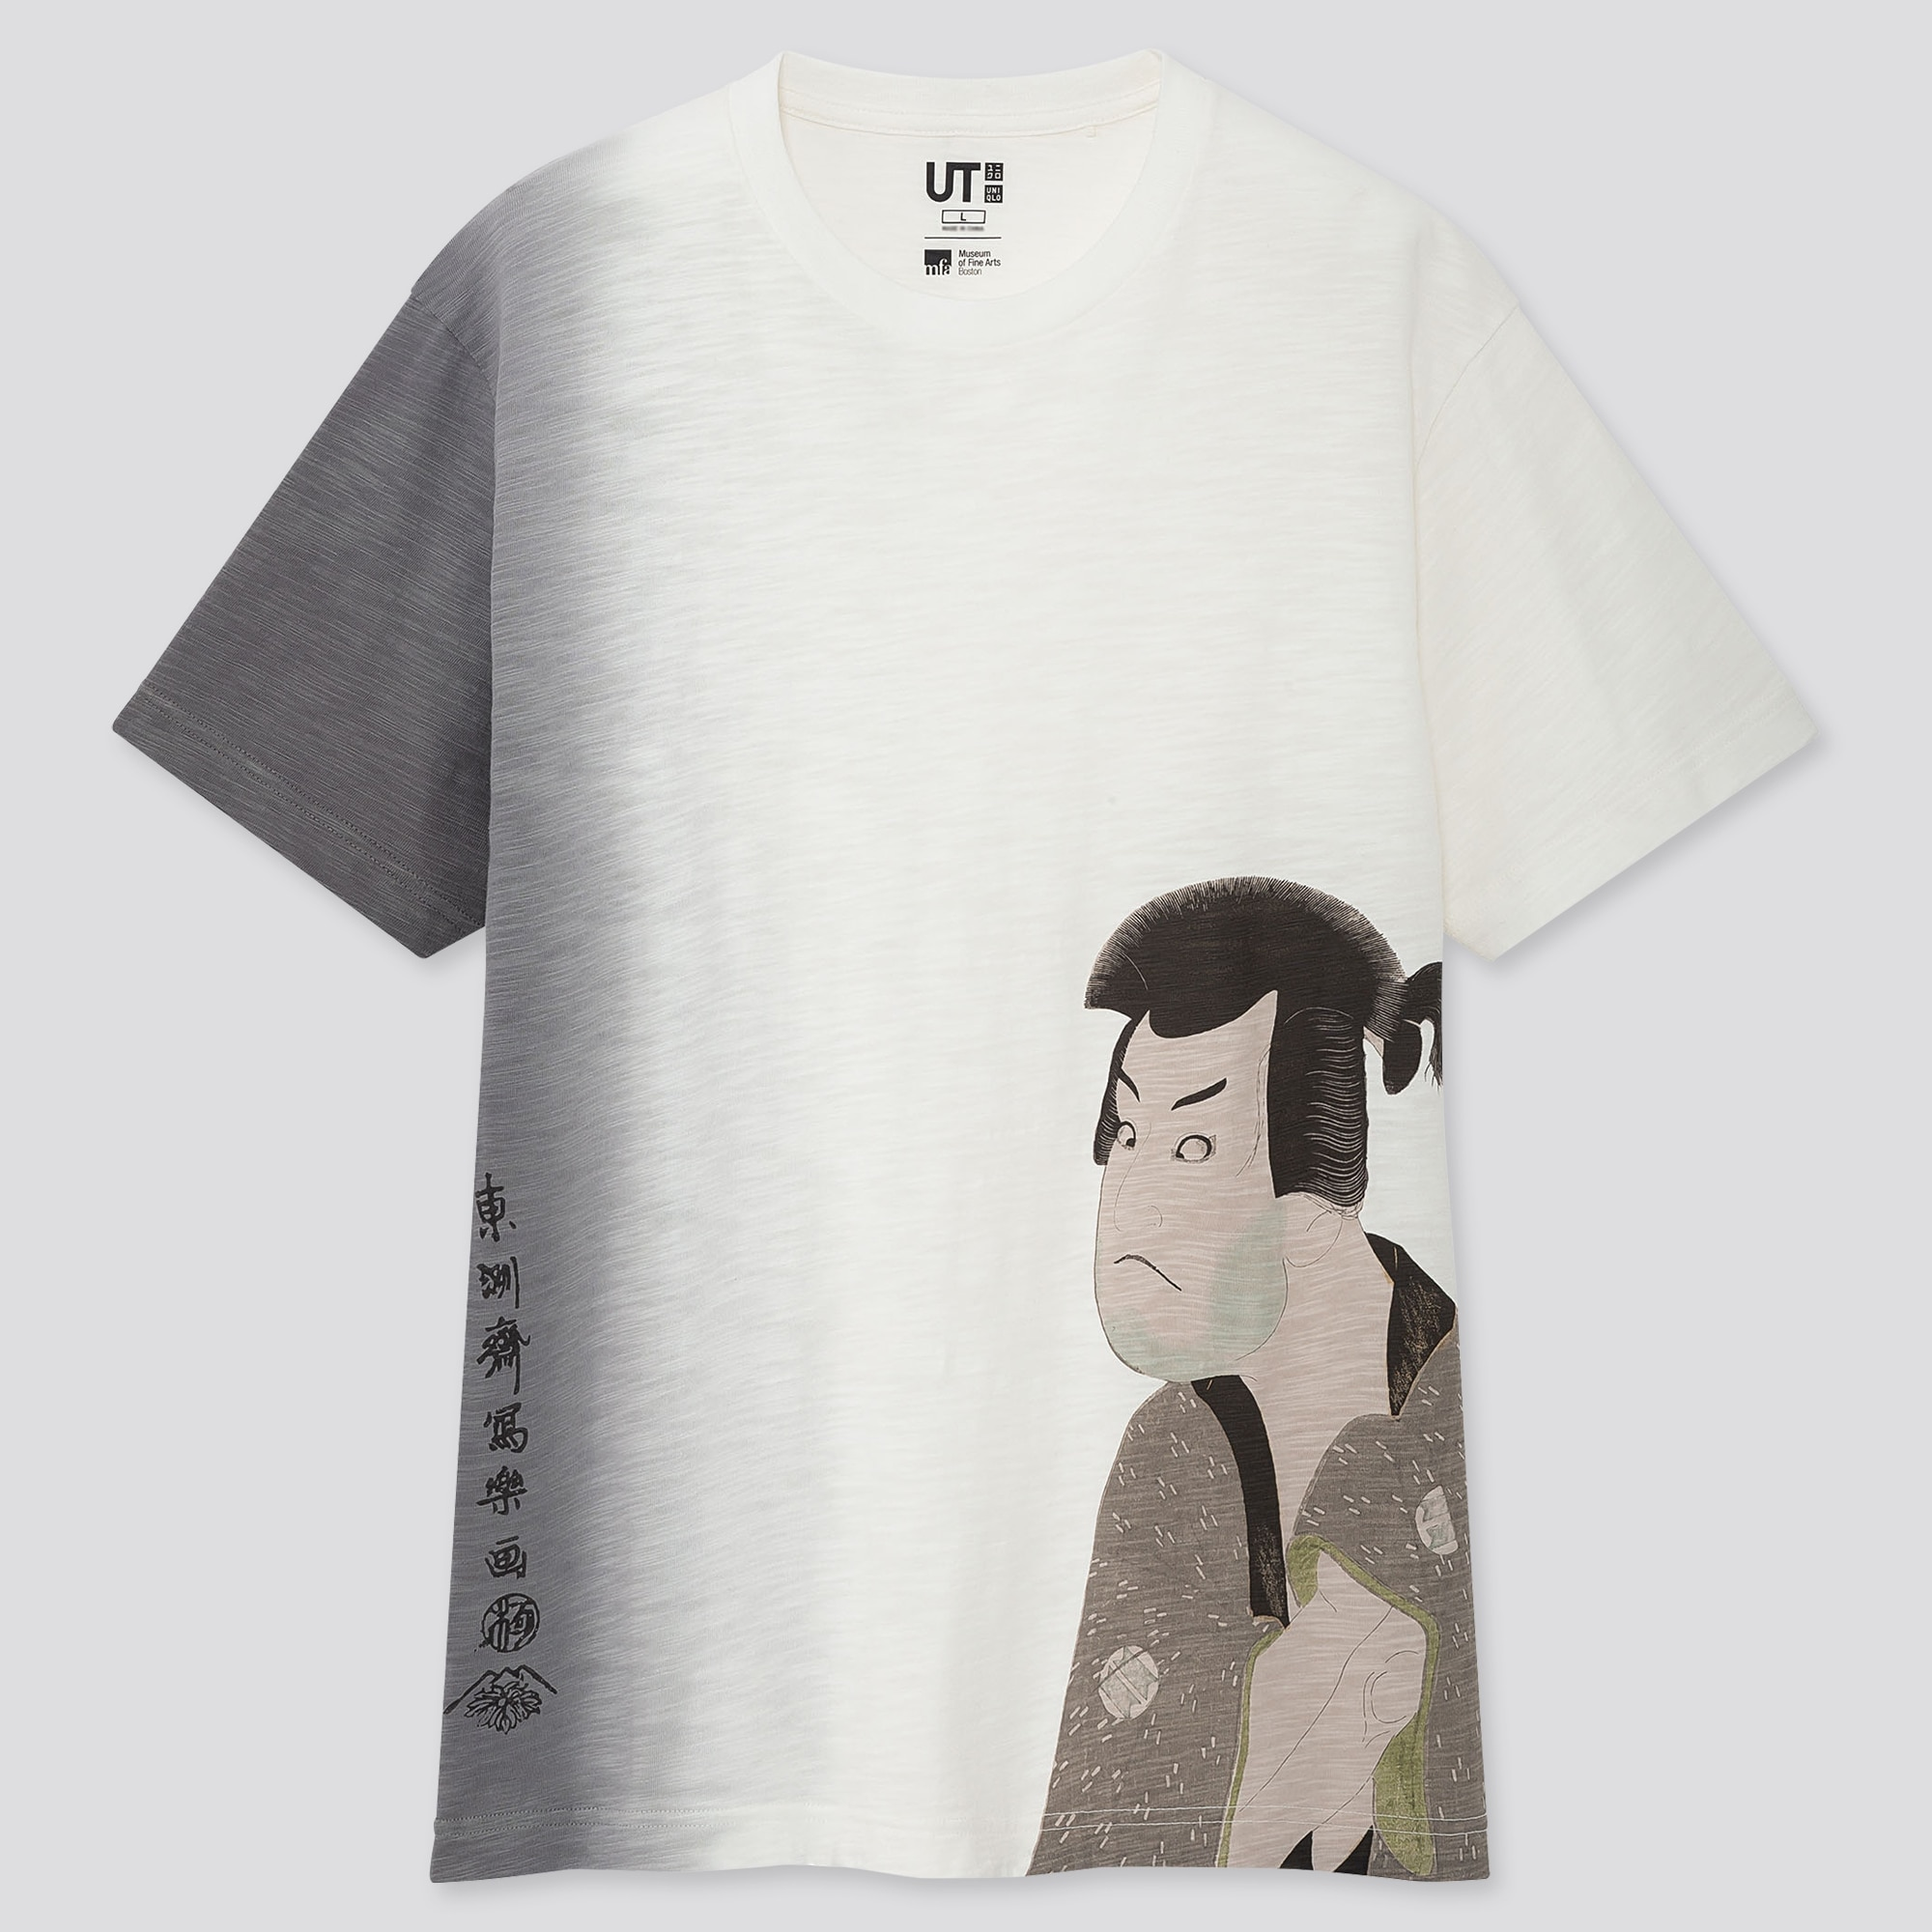 EDO UKIYO-E UT TOSHUSAI SHARAKU (SHORT-SLEEVE GRAPHIC T-SHIRT)